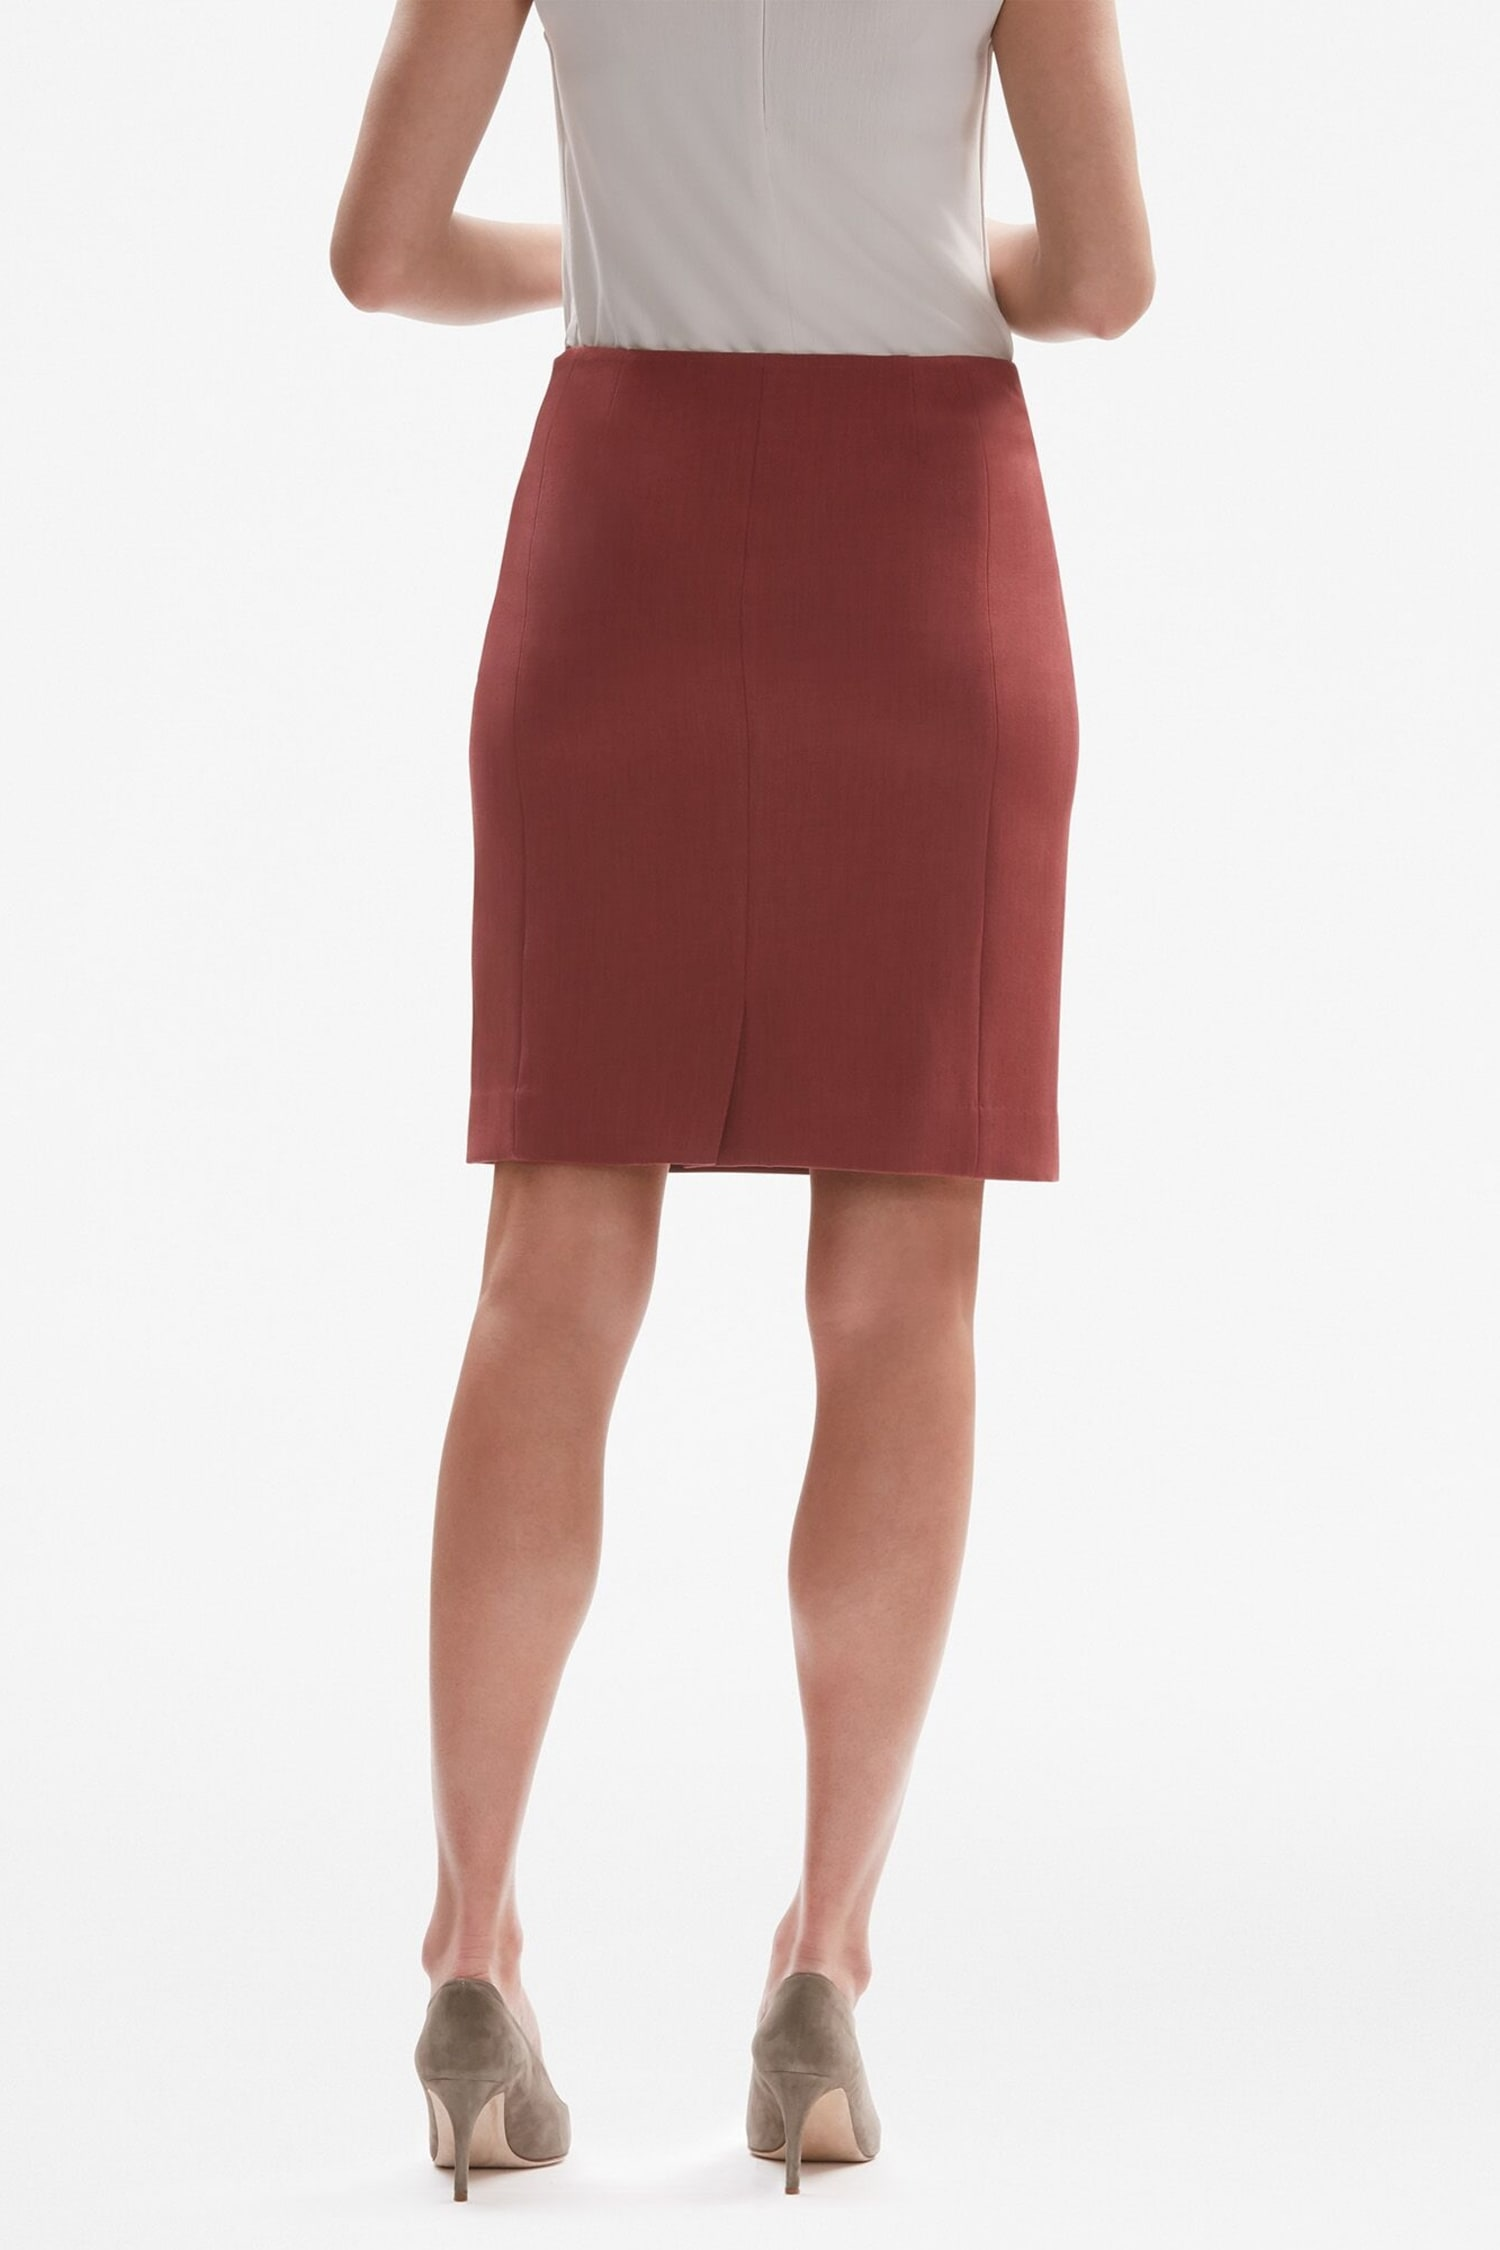 80460b76dc Noho Skirt - Brick Red   MM.LaFleur